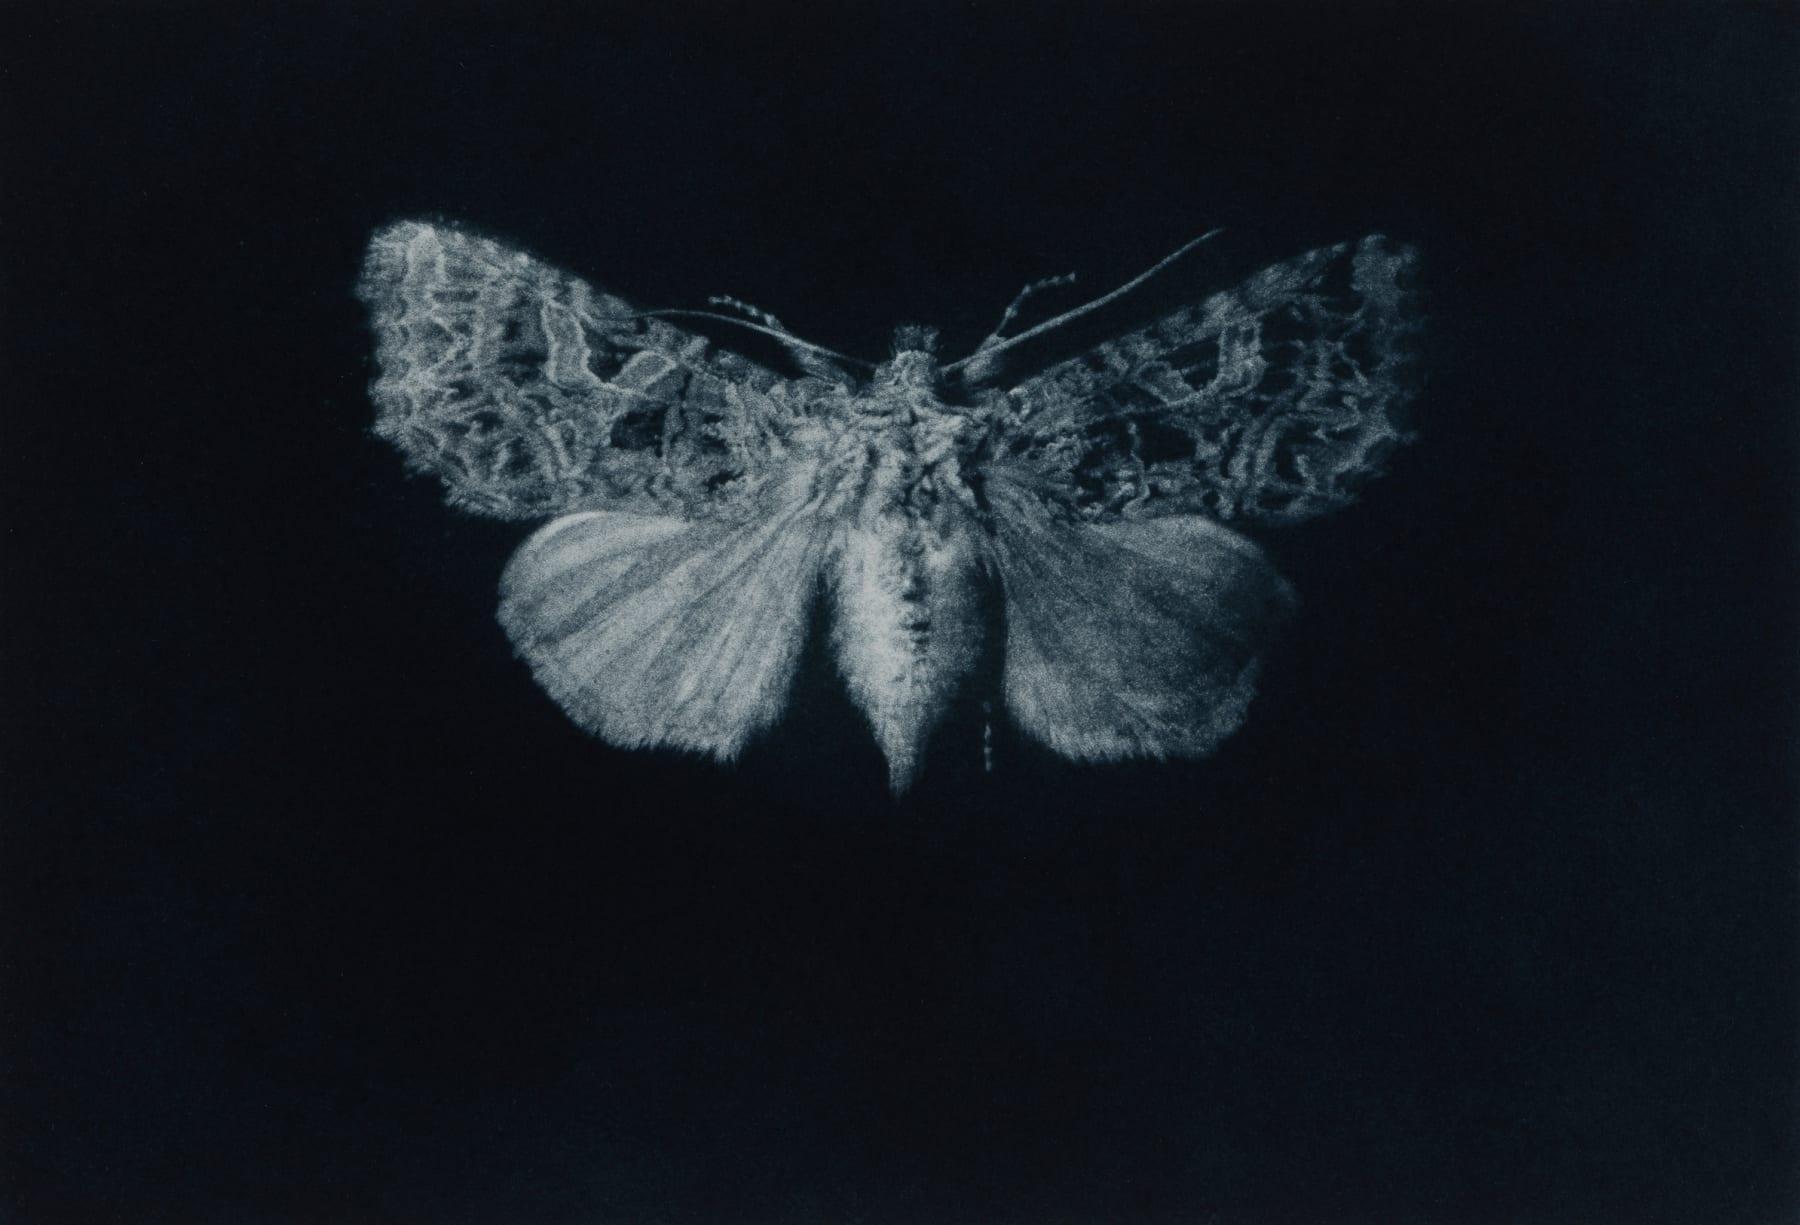 Sarah Gillespie, Campion Moth, 2019